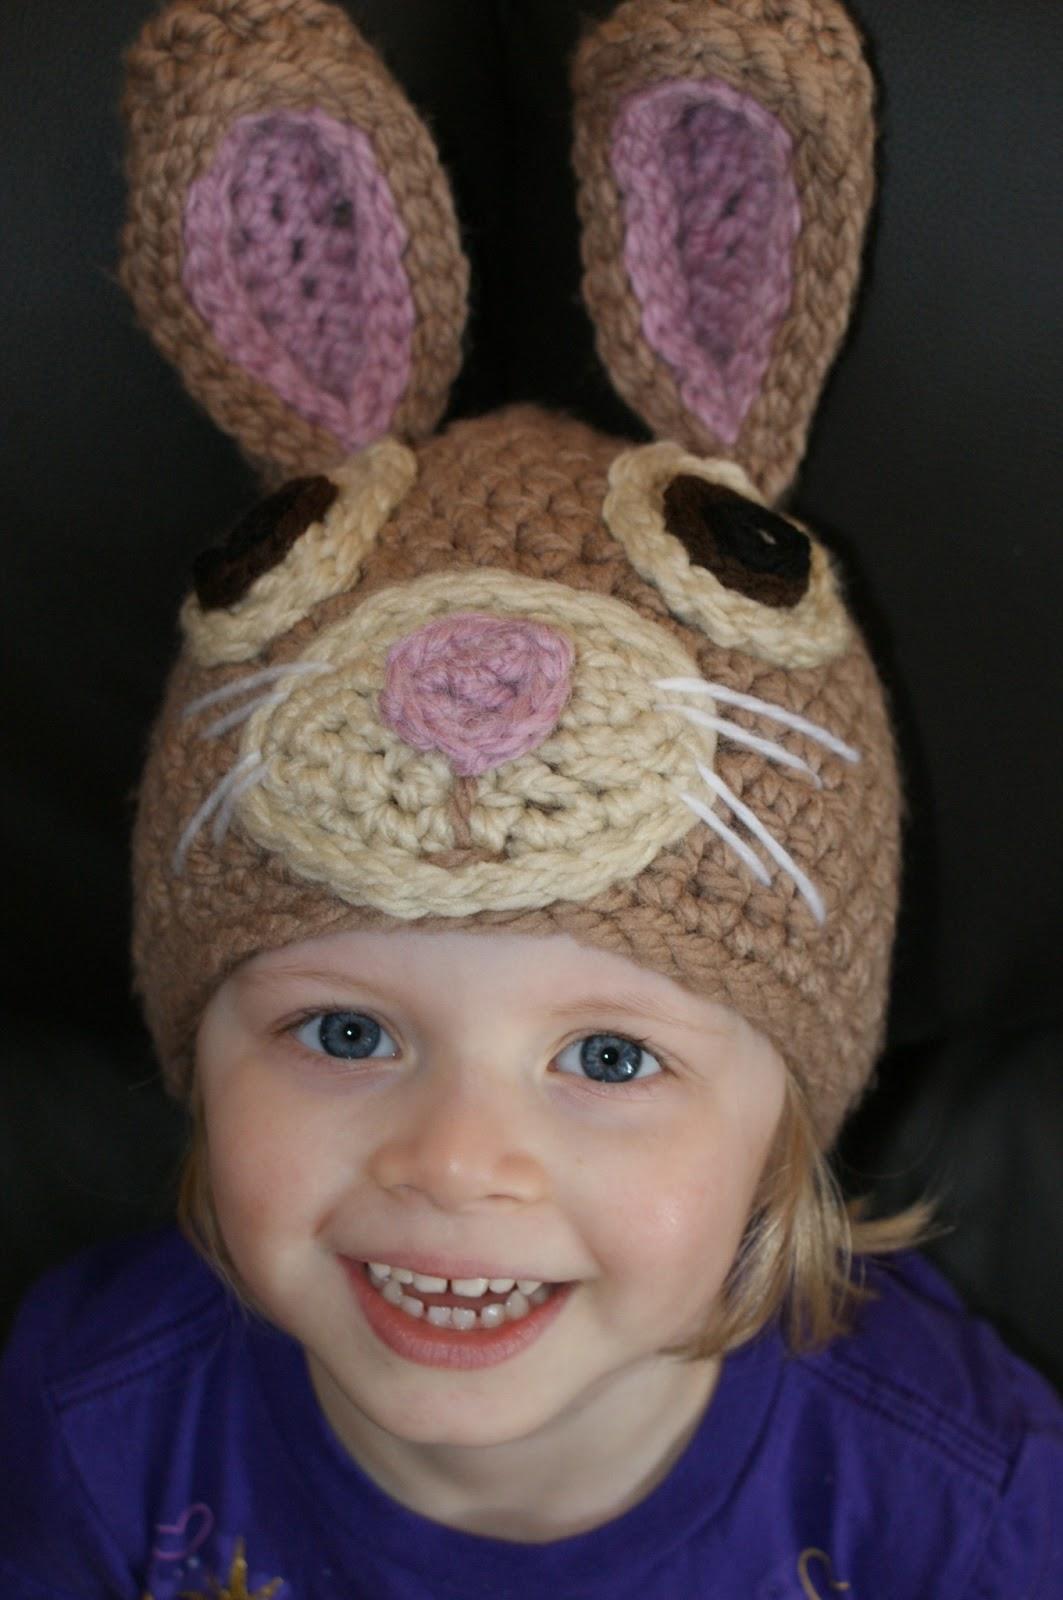 Free Crochet Patterns Bunny Hat : Darlas Bunny Hat Oombawka Design Crochet